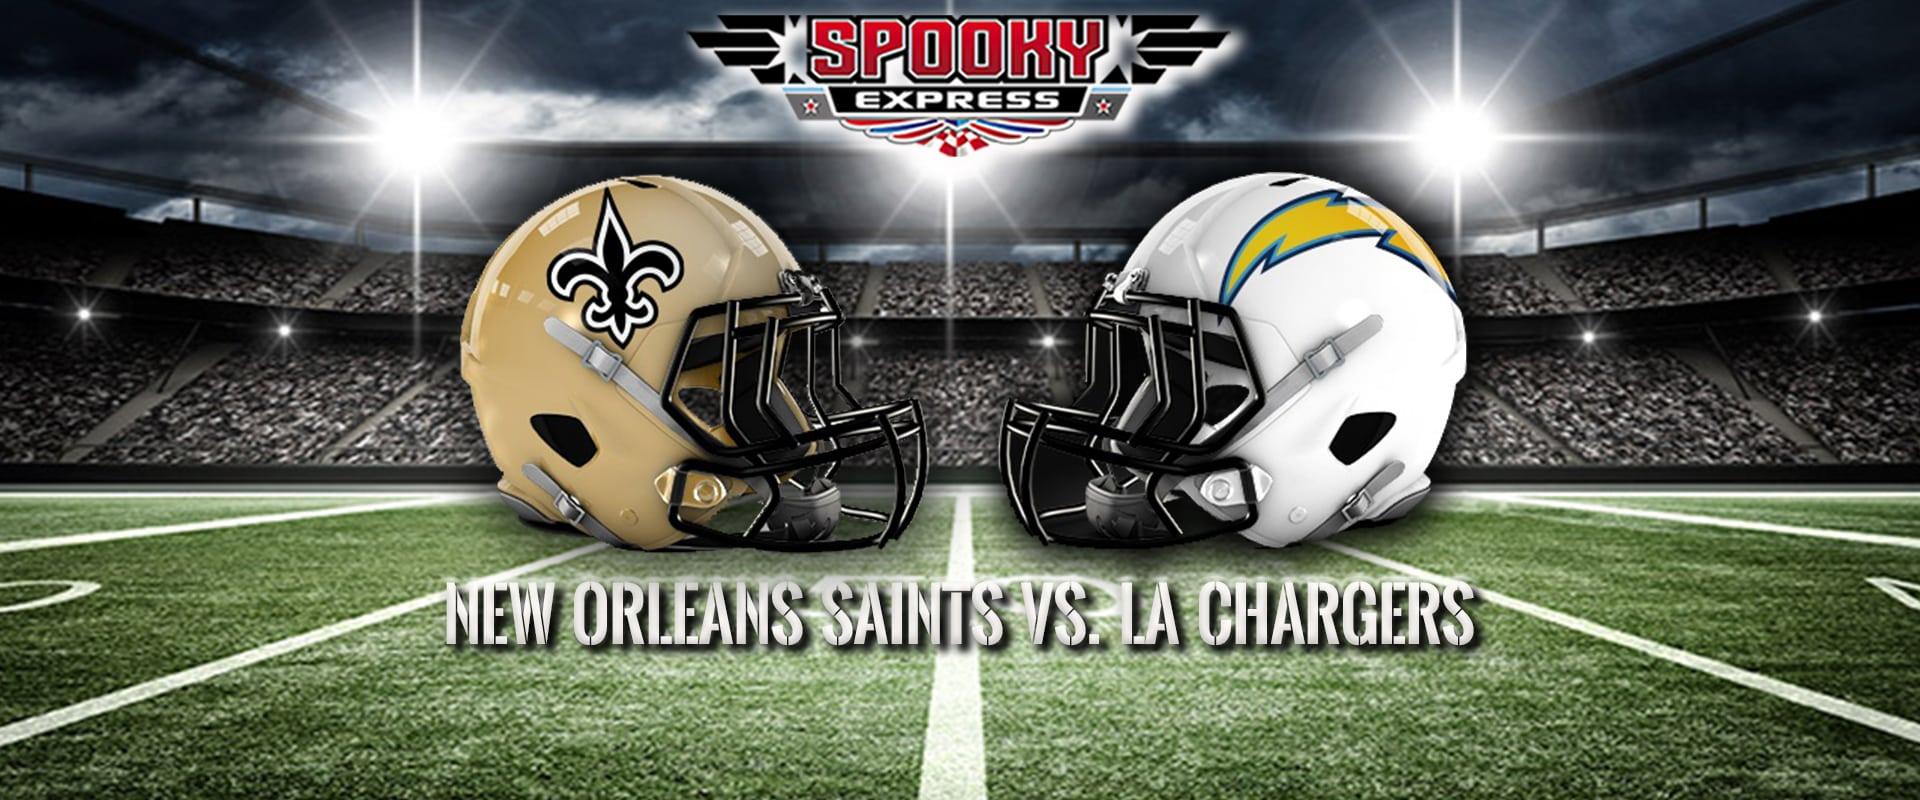 NFL Betting Preview: New Orleans Saints vs. LA Chargers